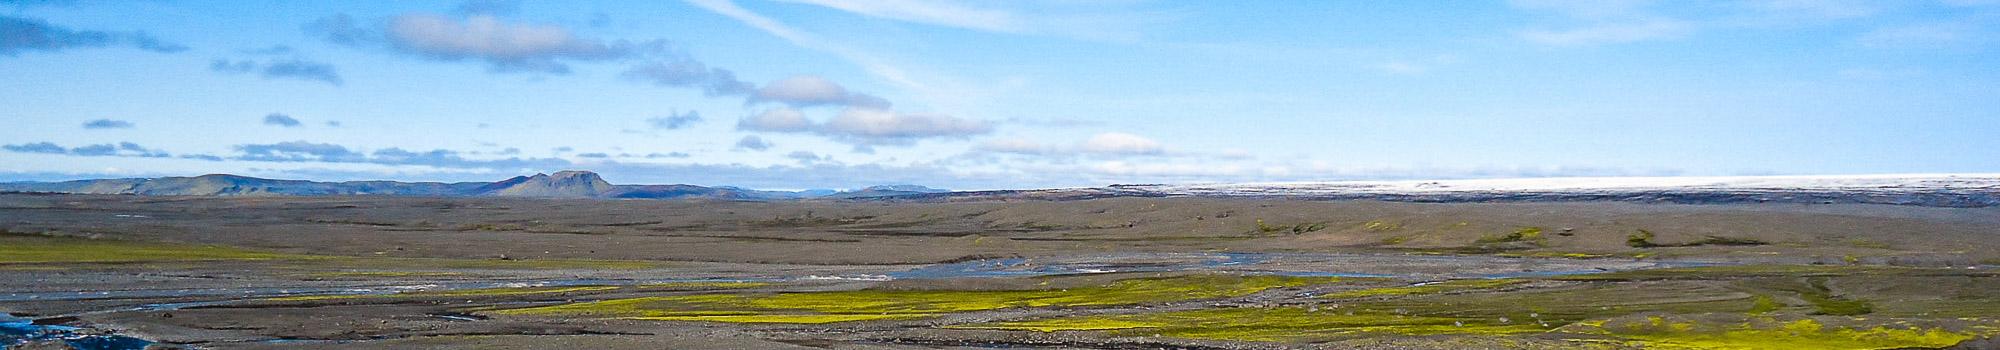 Vatnajokull area view